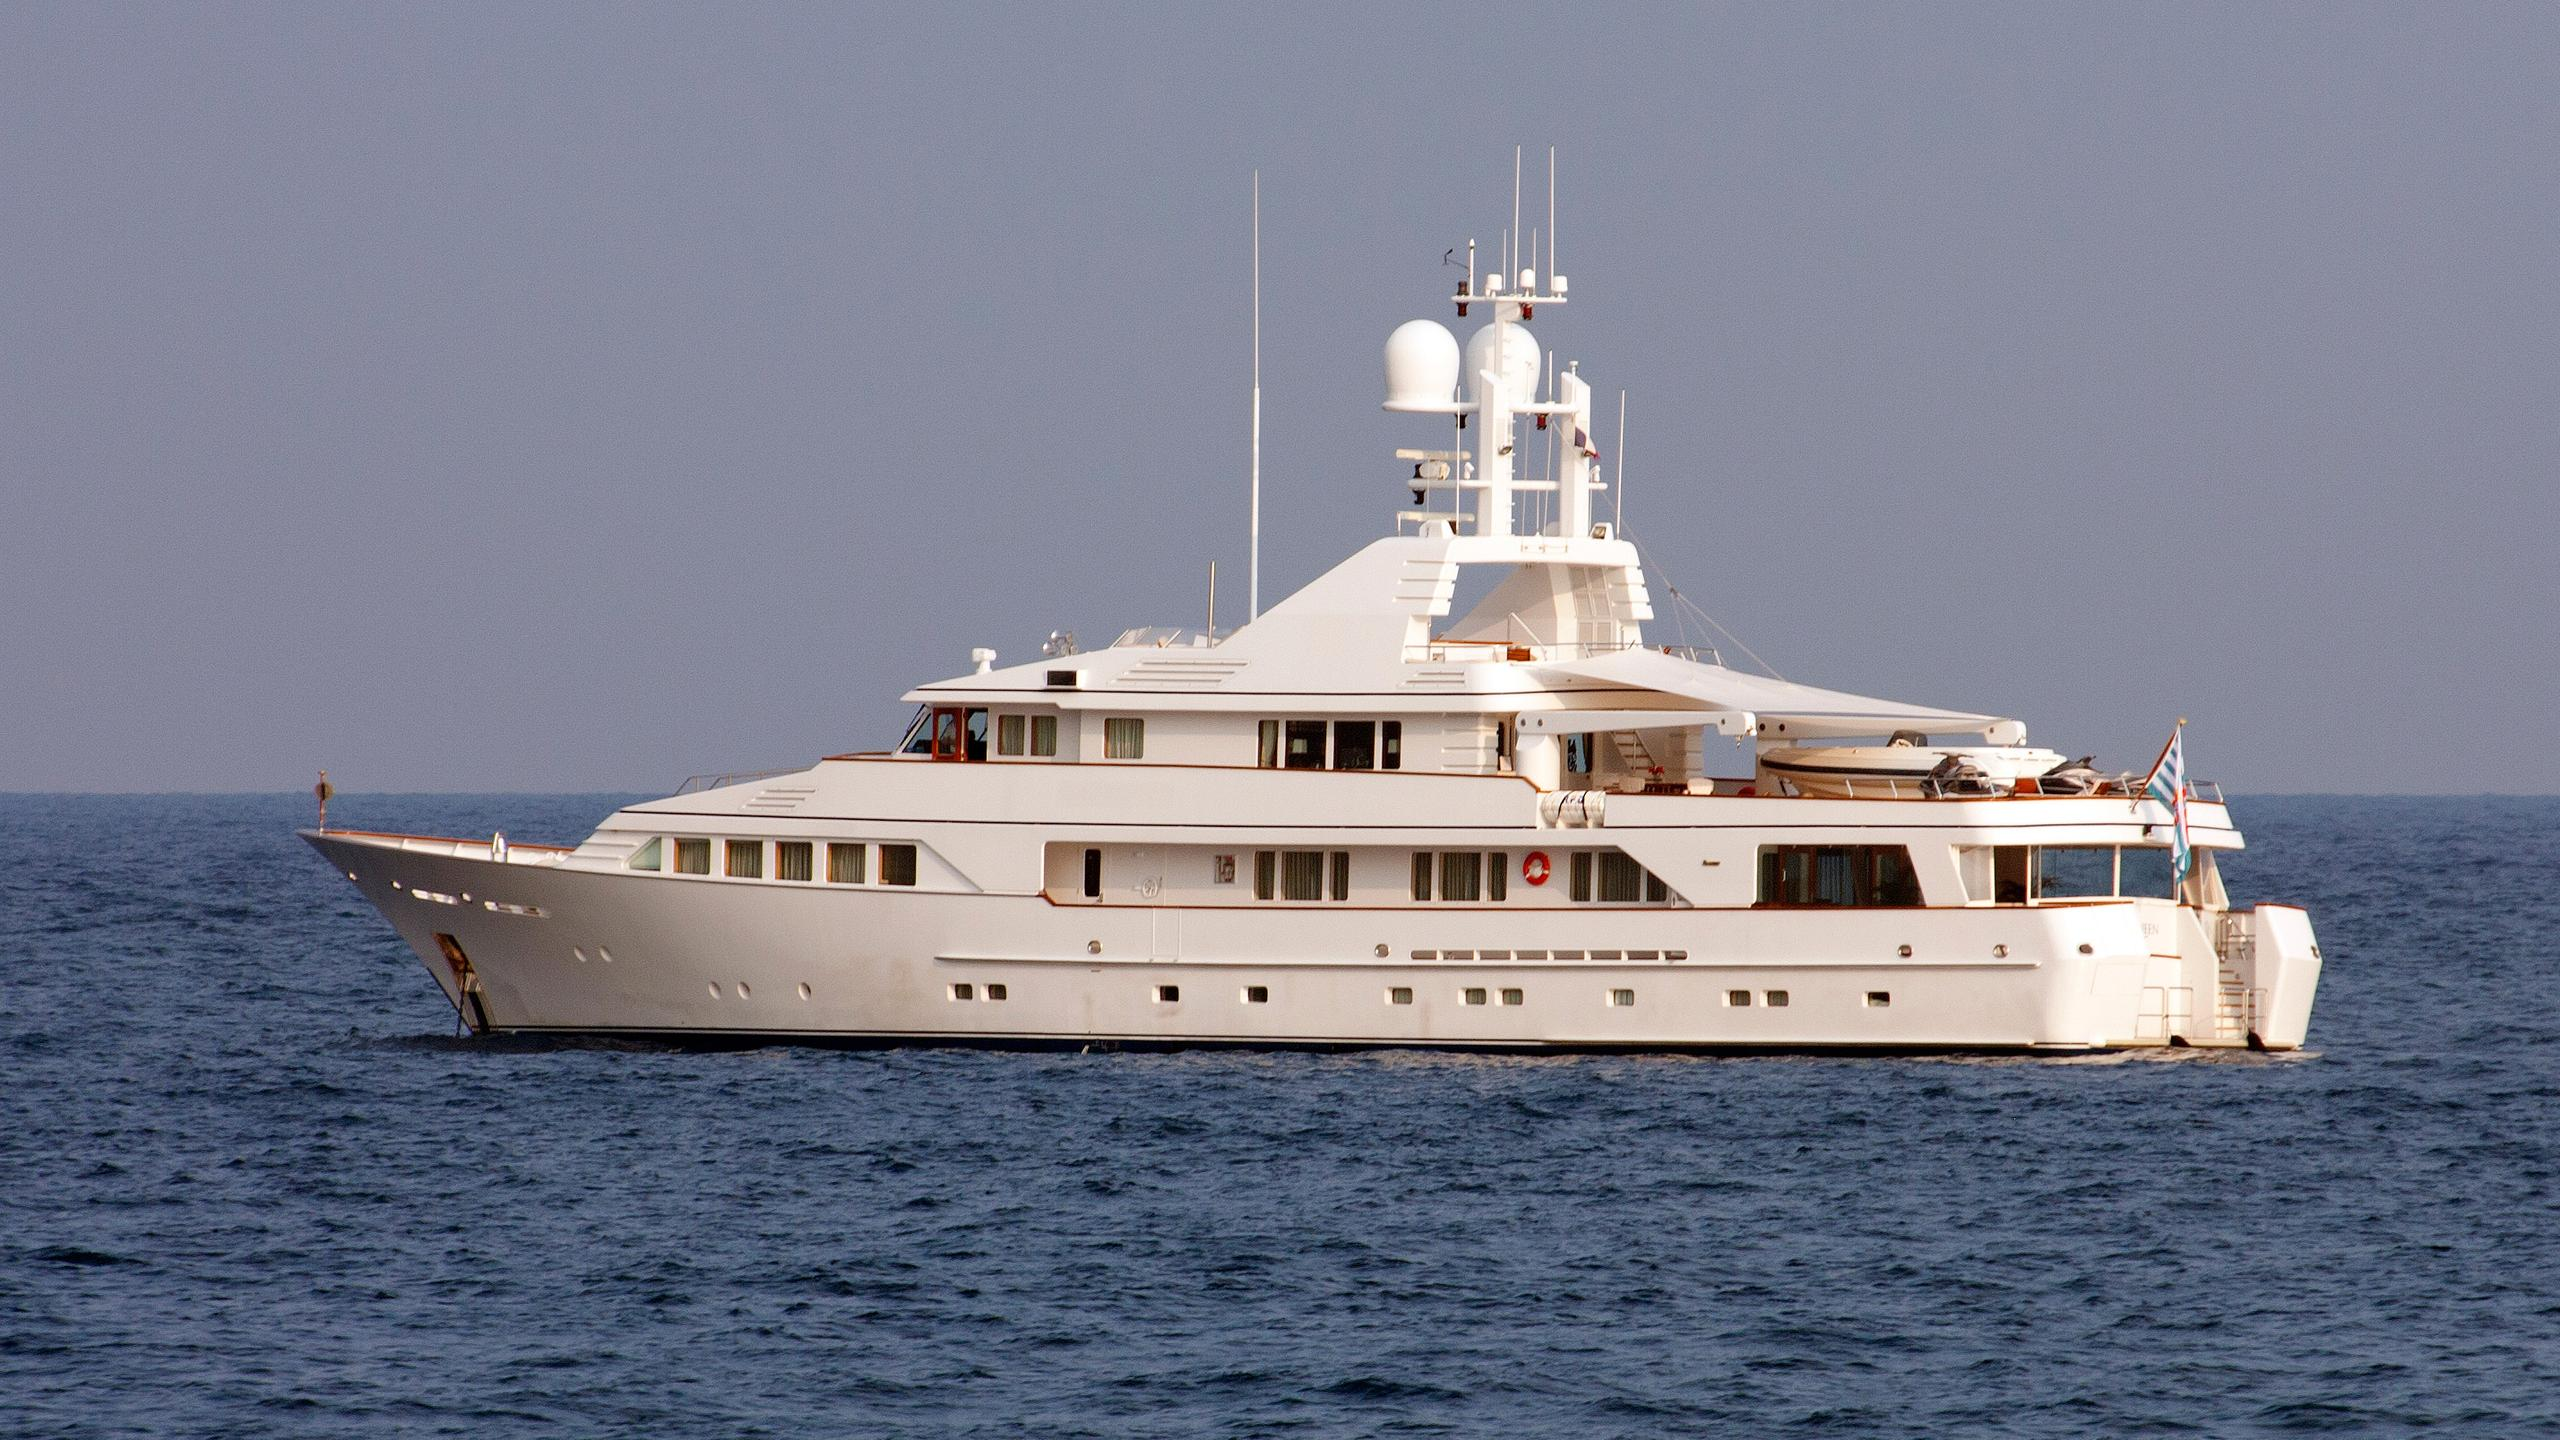 mq2-motor-yacht-fedship-1990-49m-profile